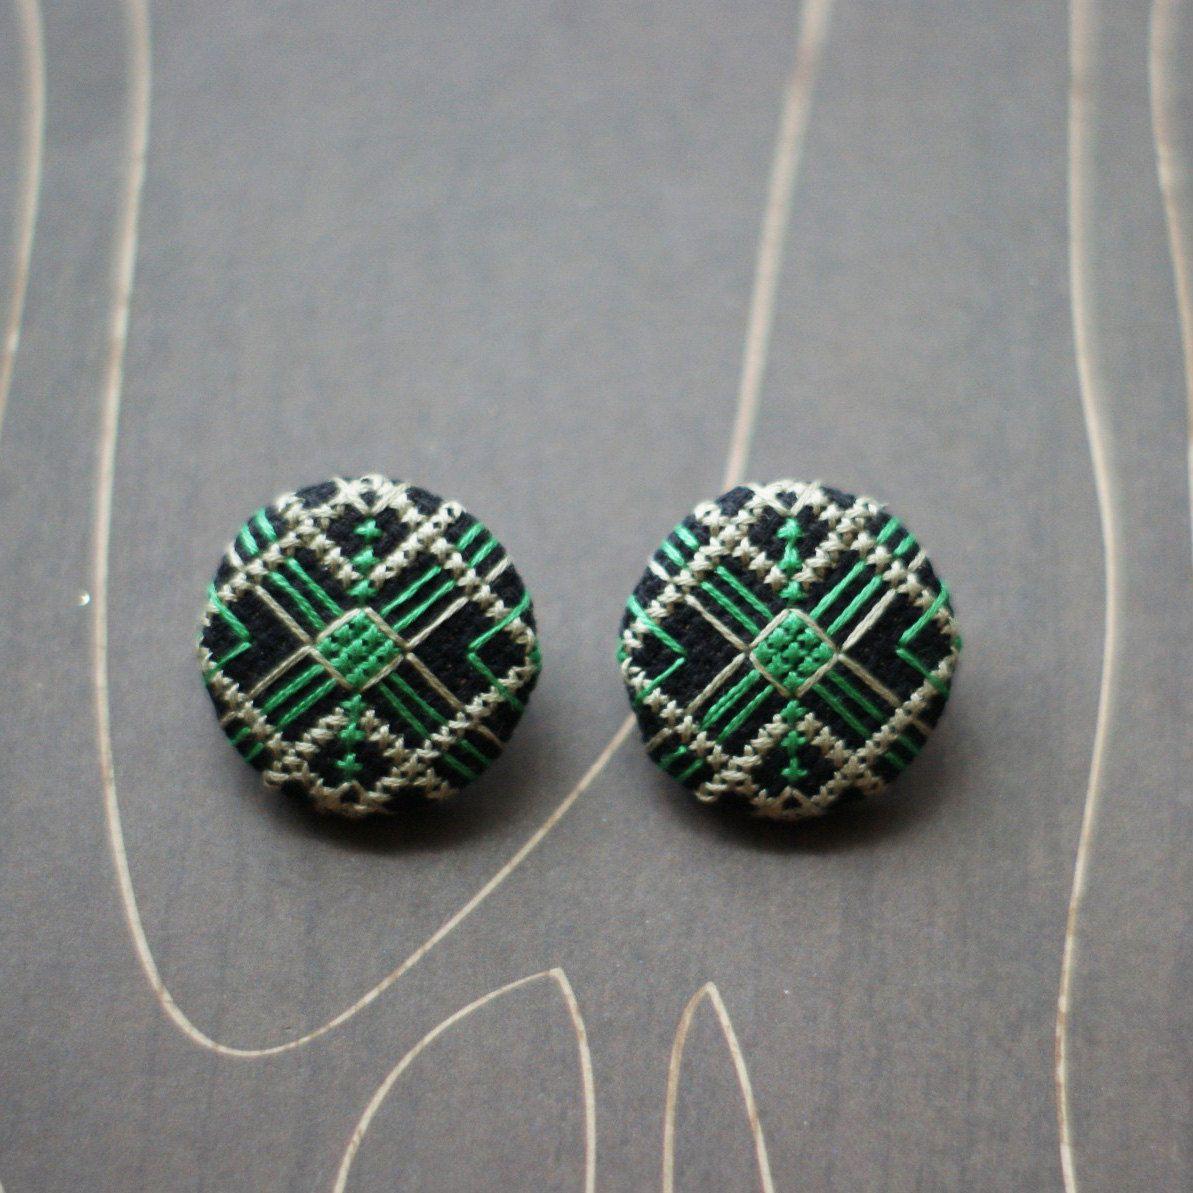 Art Deco Geometric Cross Stitch Earrings Emerald